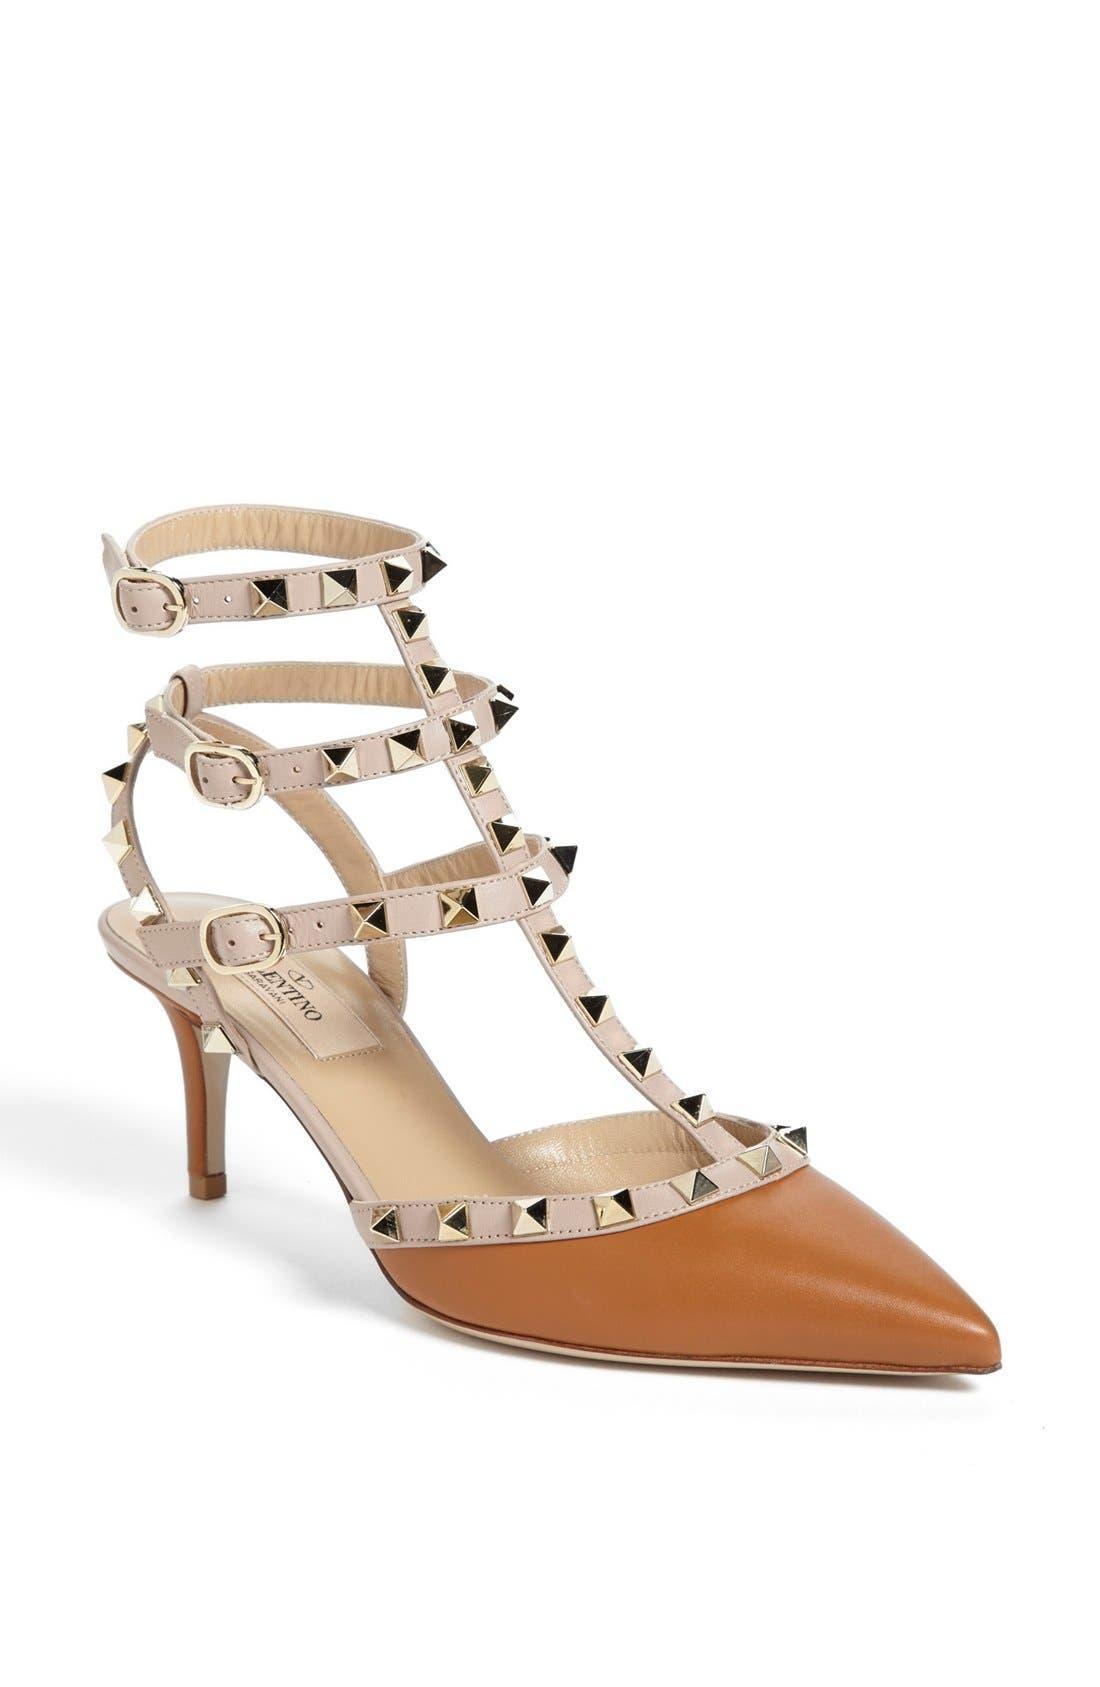 Alternate Image 1 Selected - Valentino 'Rockstud' Triple Ankle Strap Pump